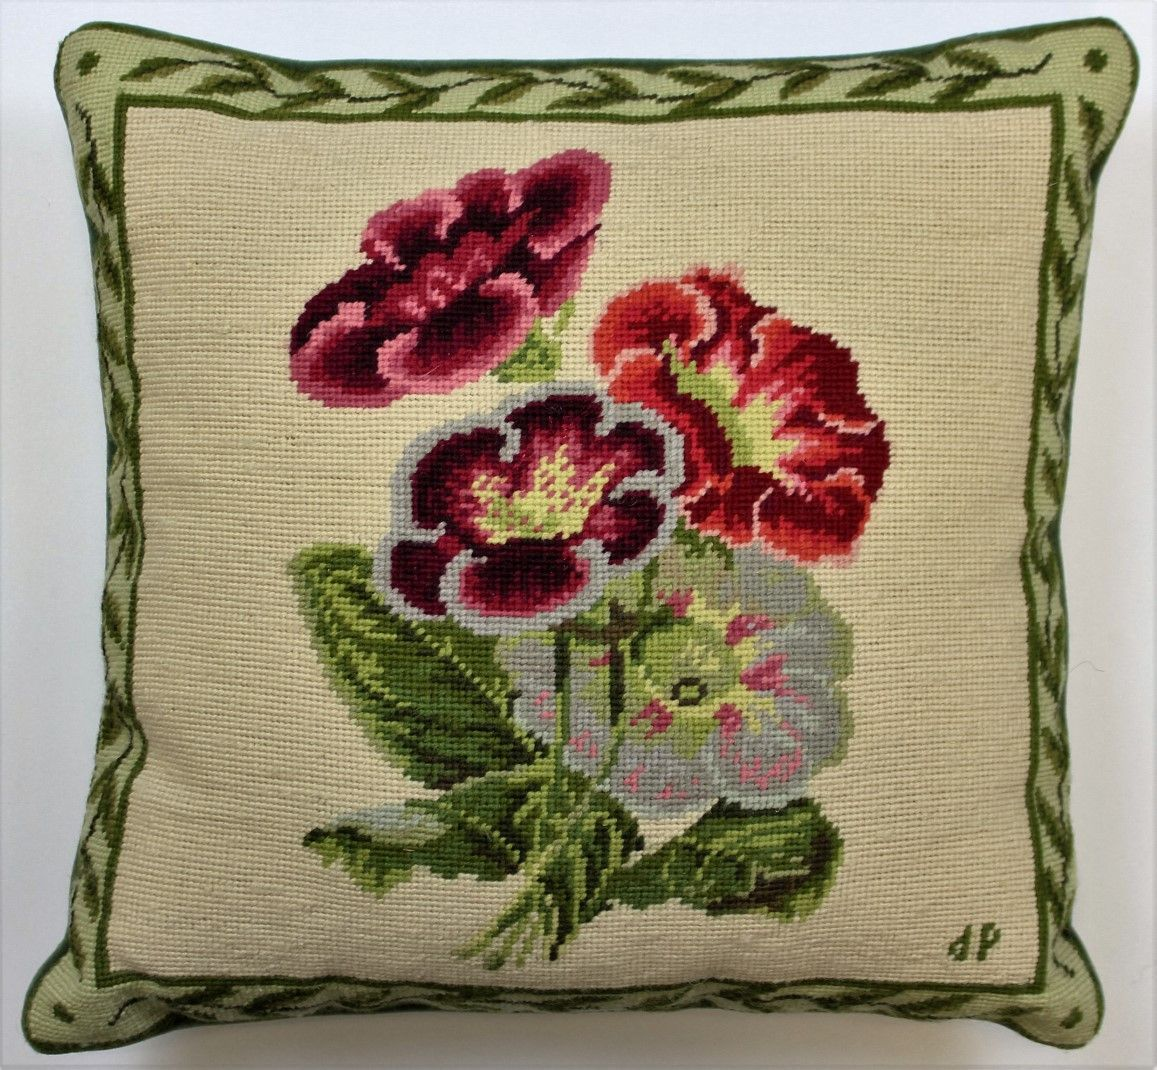 Roses & Leaves Needlepoint Pillow